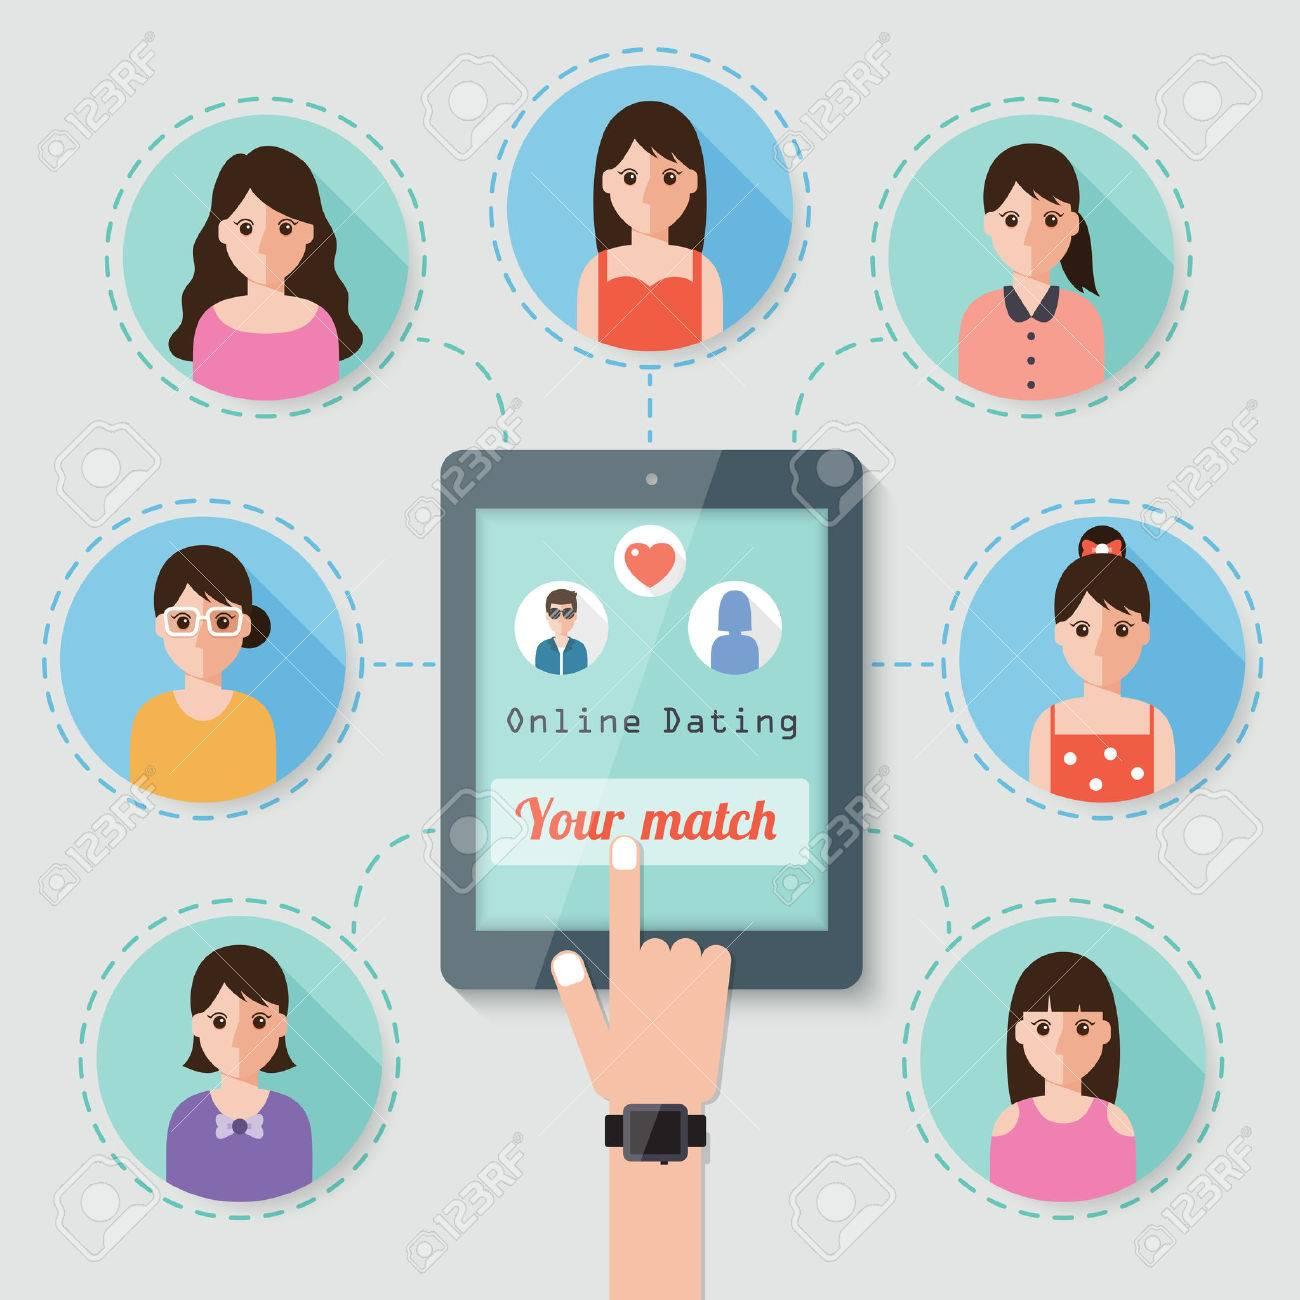 Man Seeking Woman On Online Dating Website Via Social Network